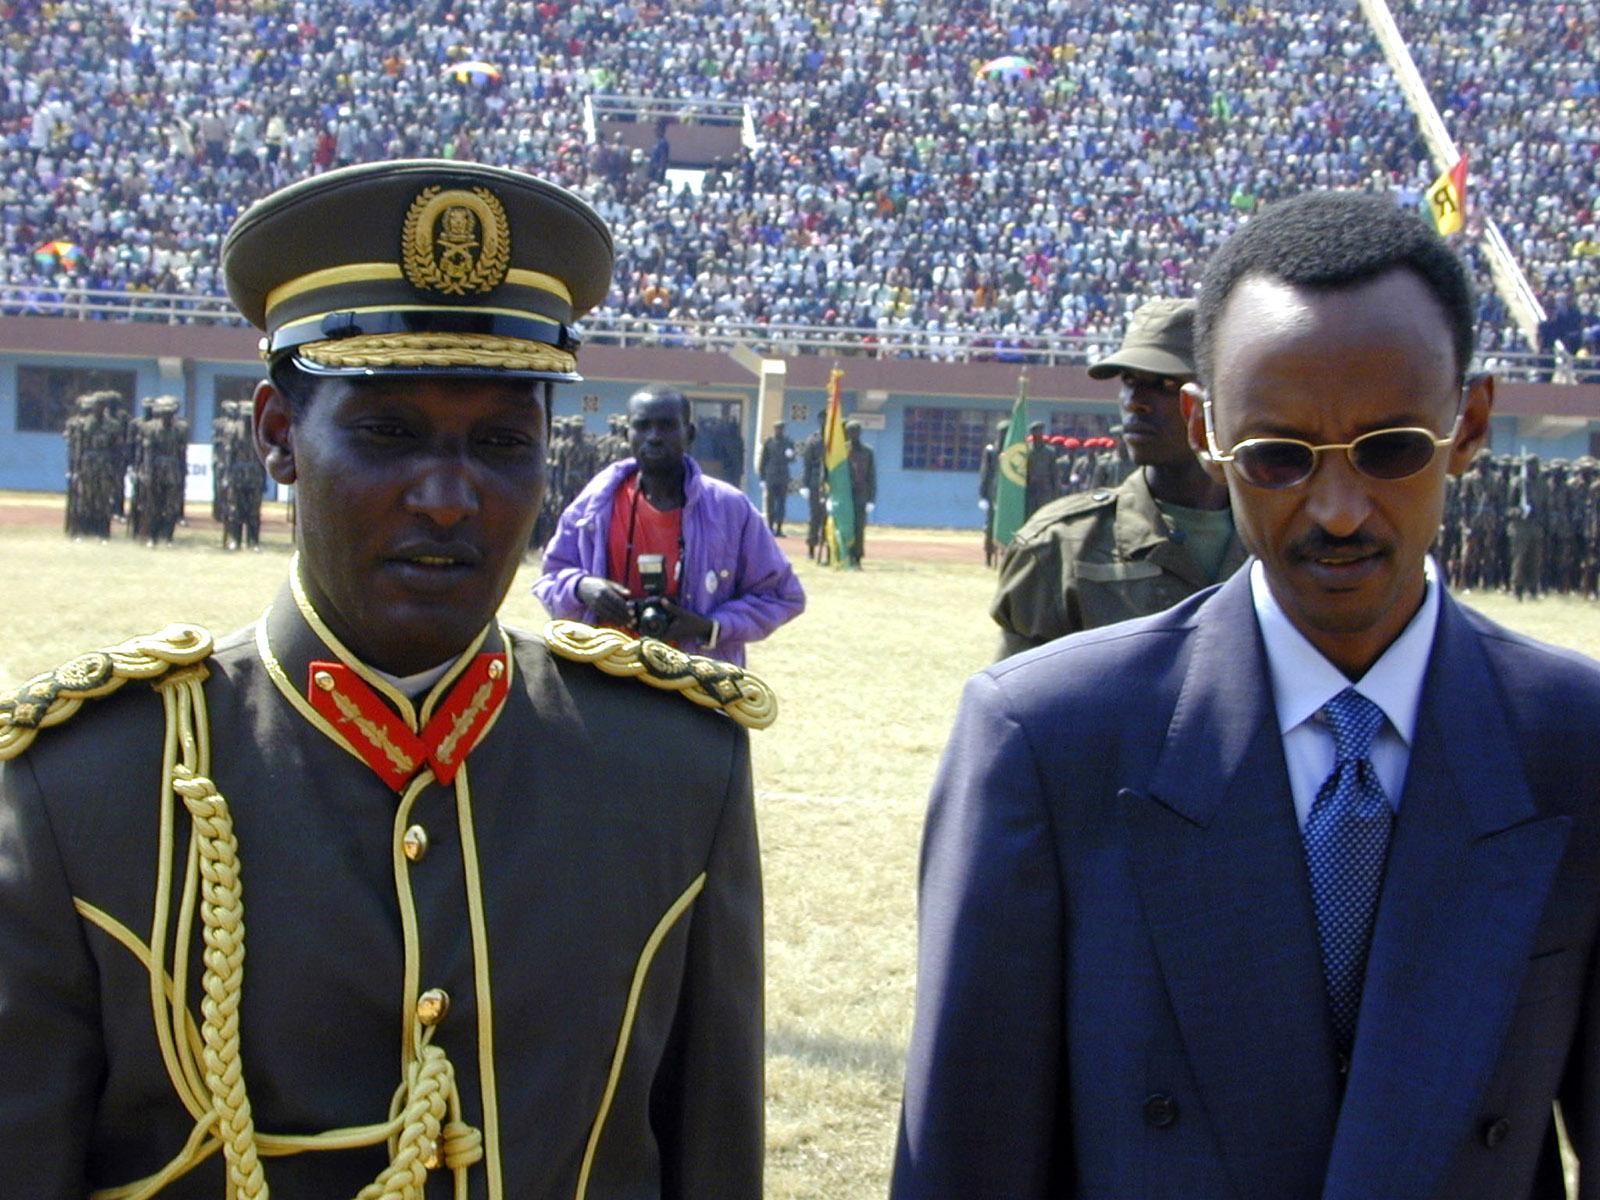 President Paul Kagame and Army Chief of Staff Kayumba Nyamwasa